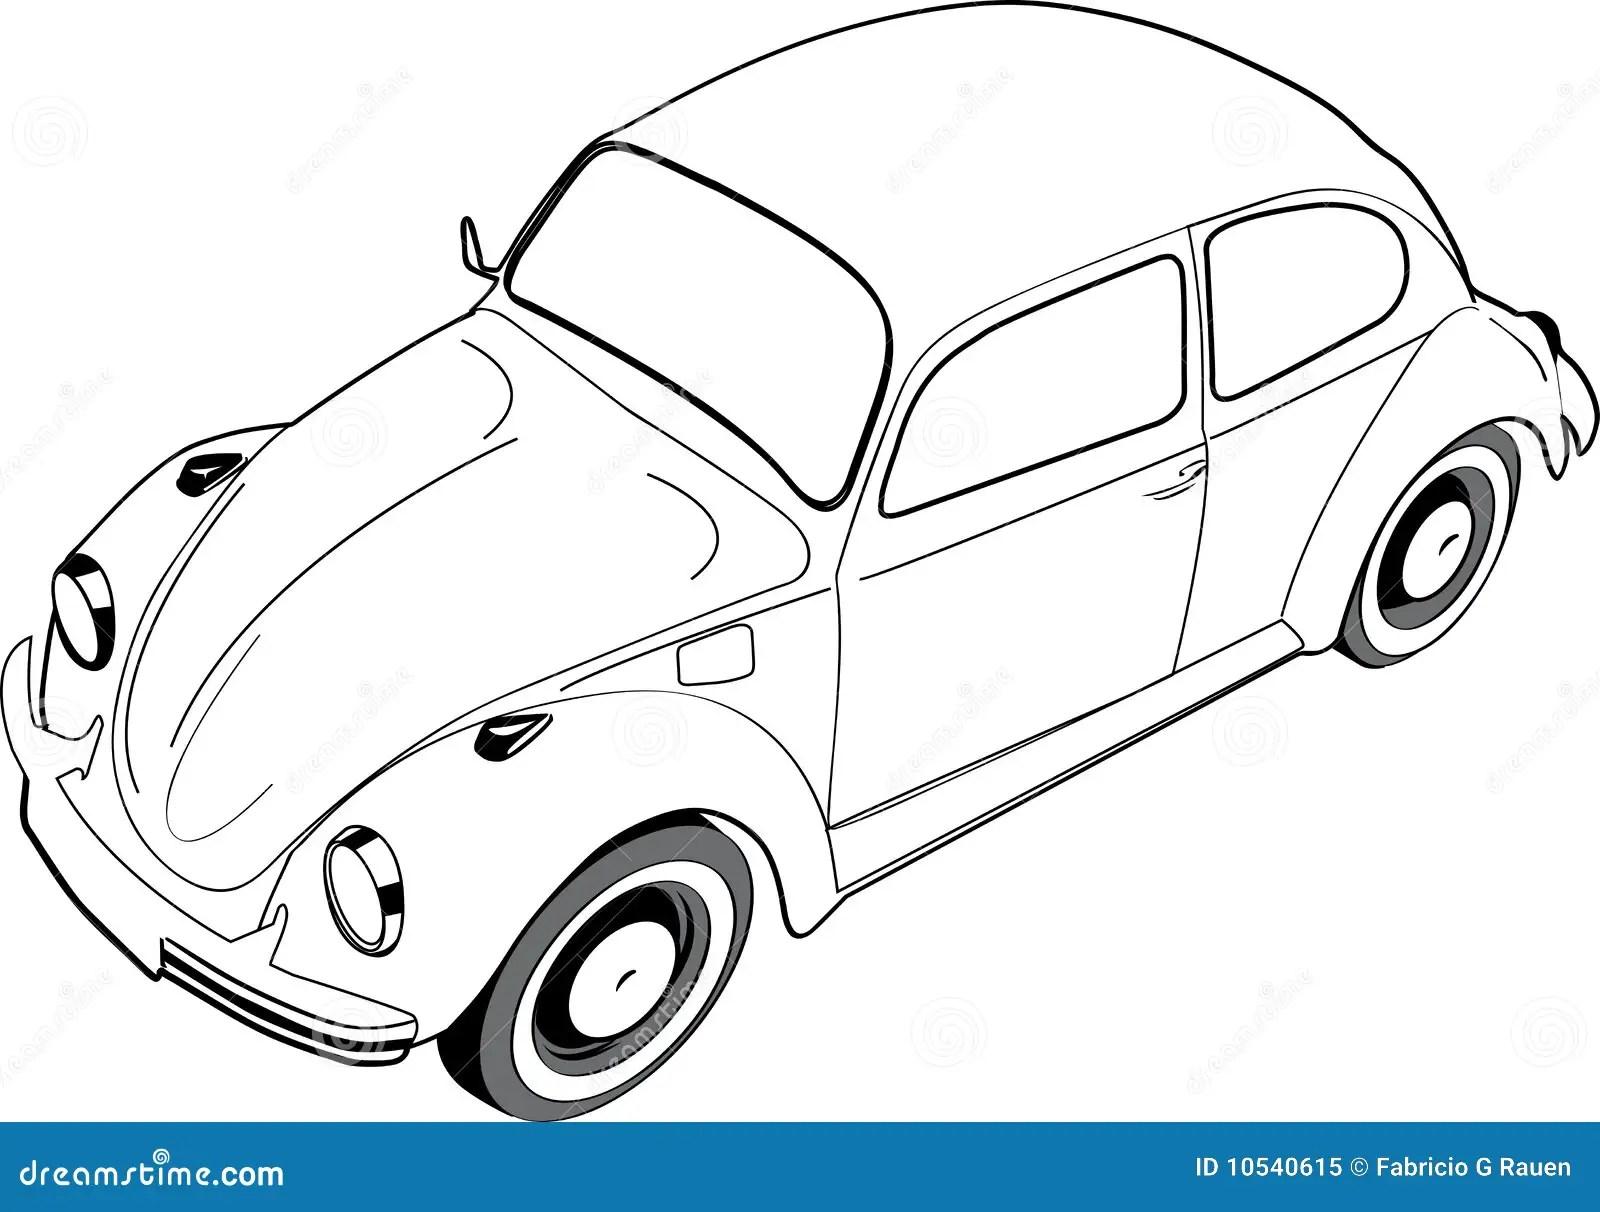 Volkswagon Beetle Or Bug Stock Vector Illustration Of